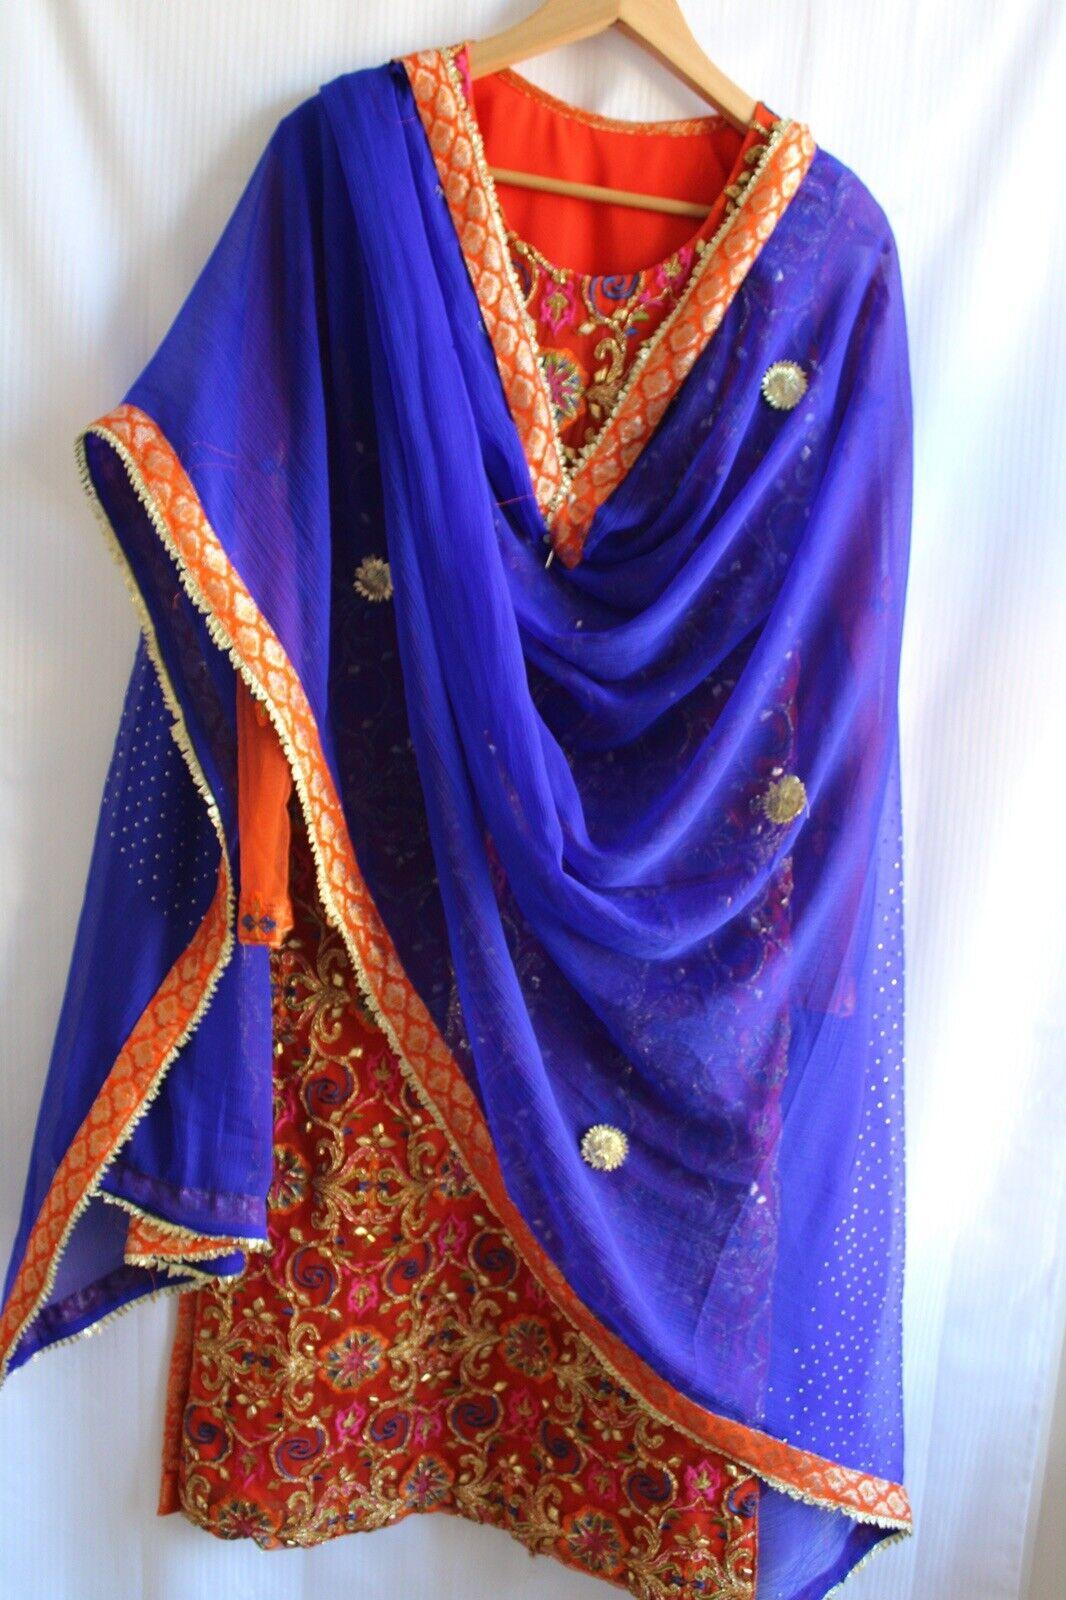 Brand New Indian Pakistani Wedding Party Dress With Dupatta - With Dupatta.